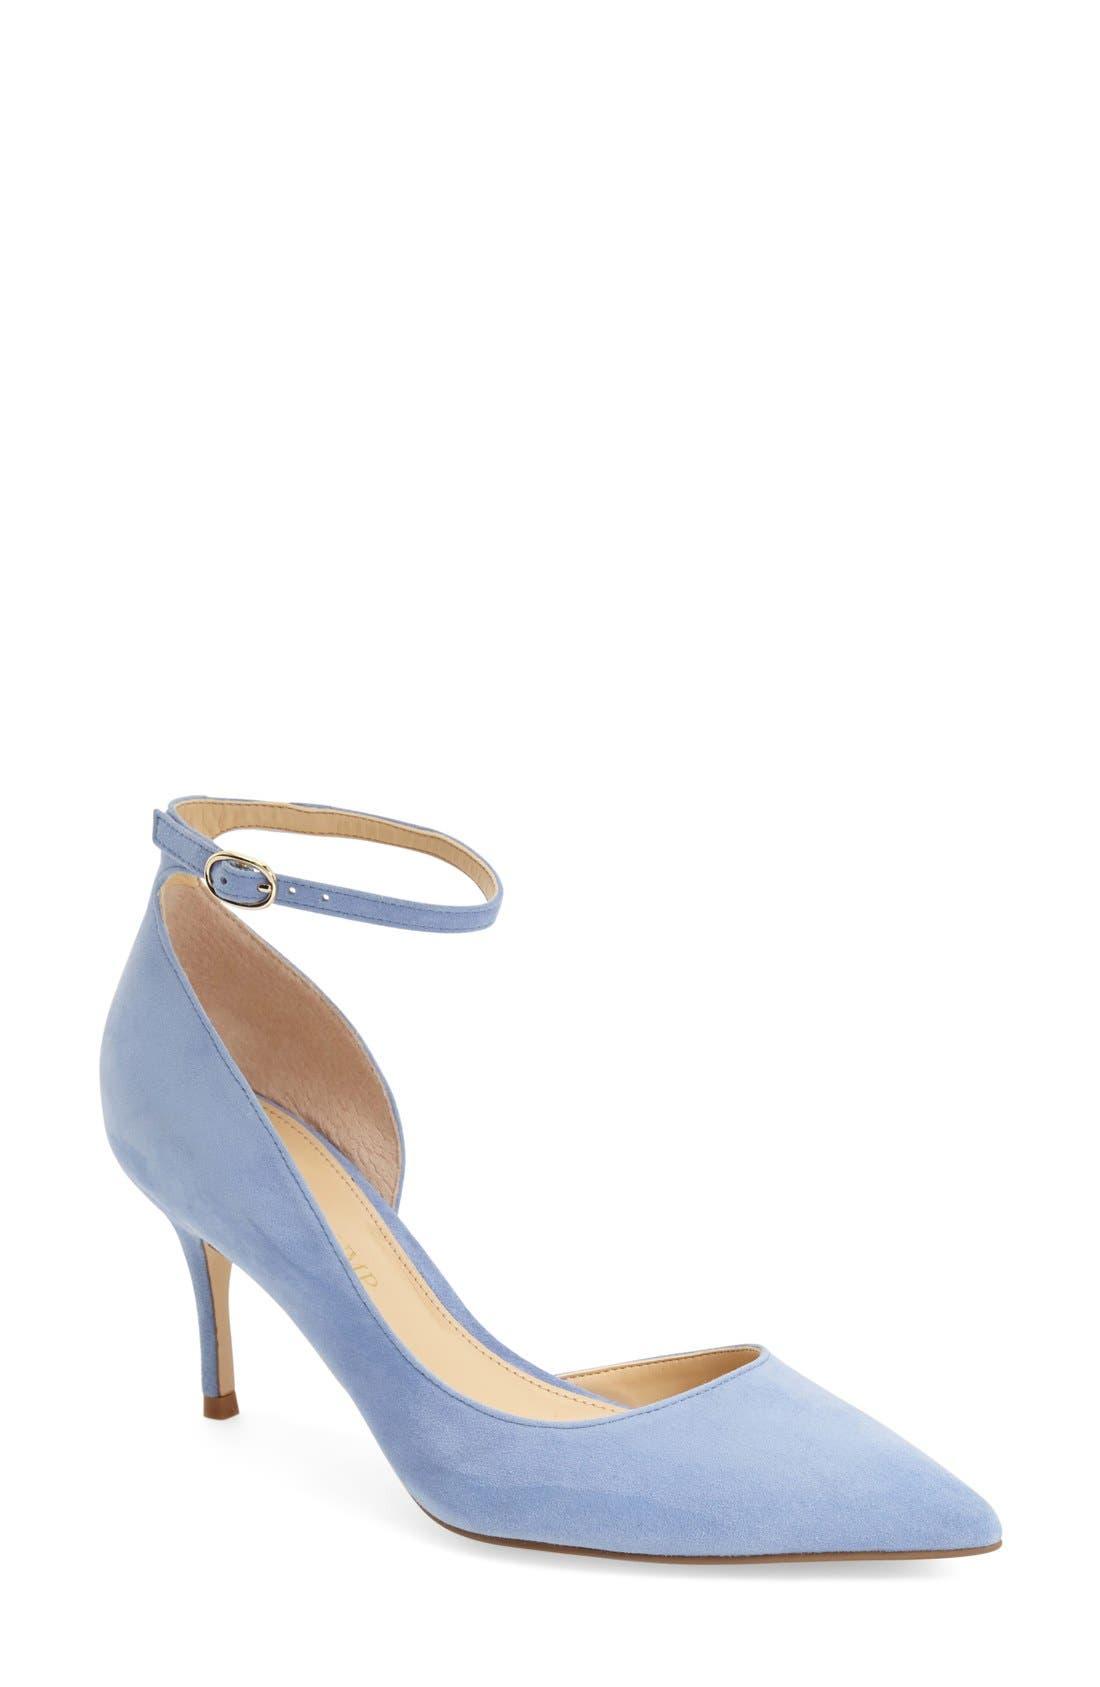 Main Image - Ivanka Trump 'Brita' Ankle Strap Pointy Toe Pump (Women)